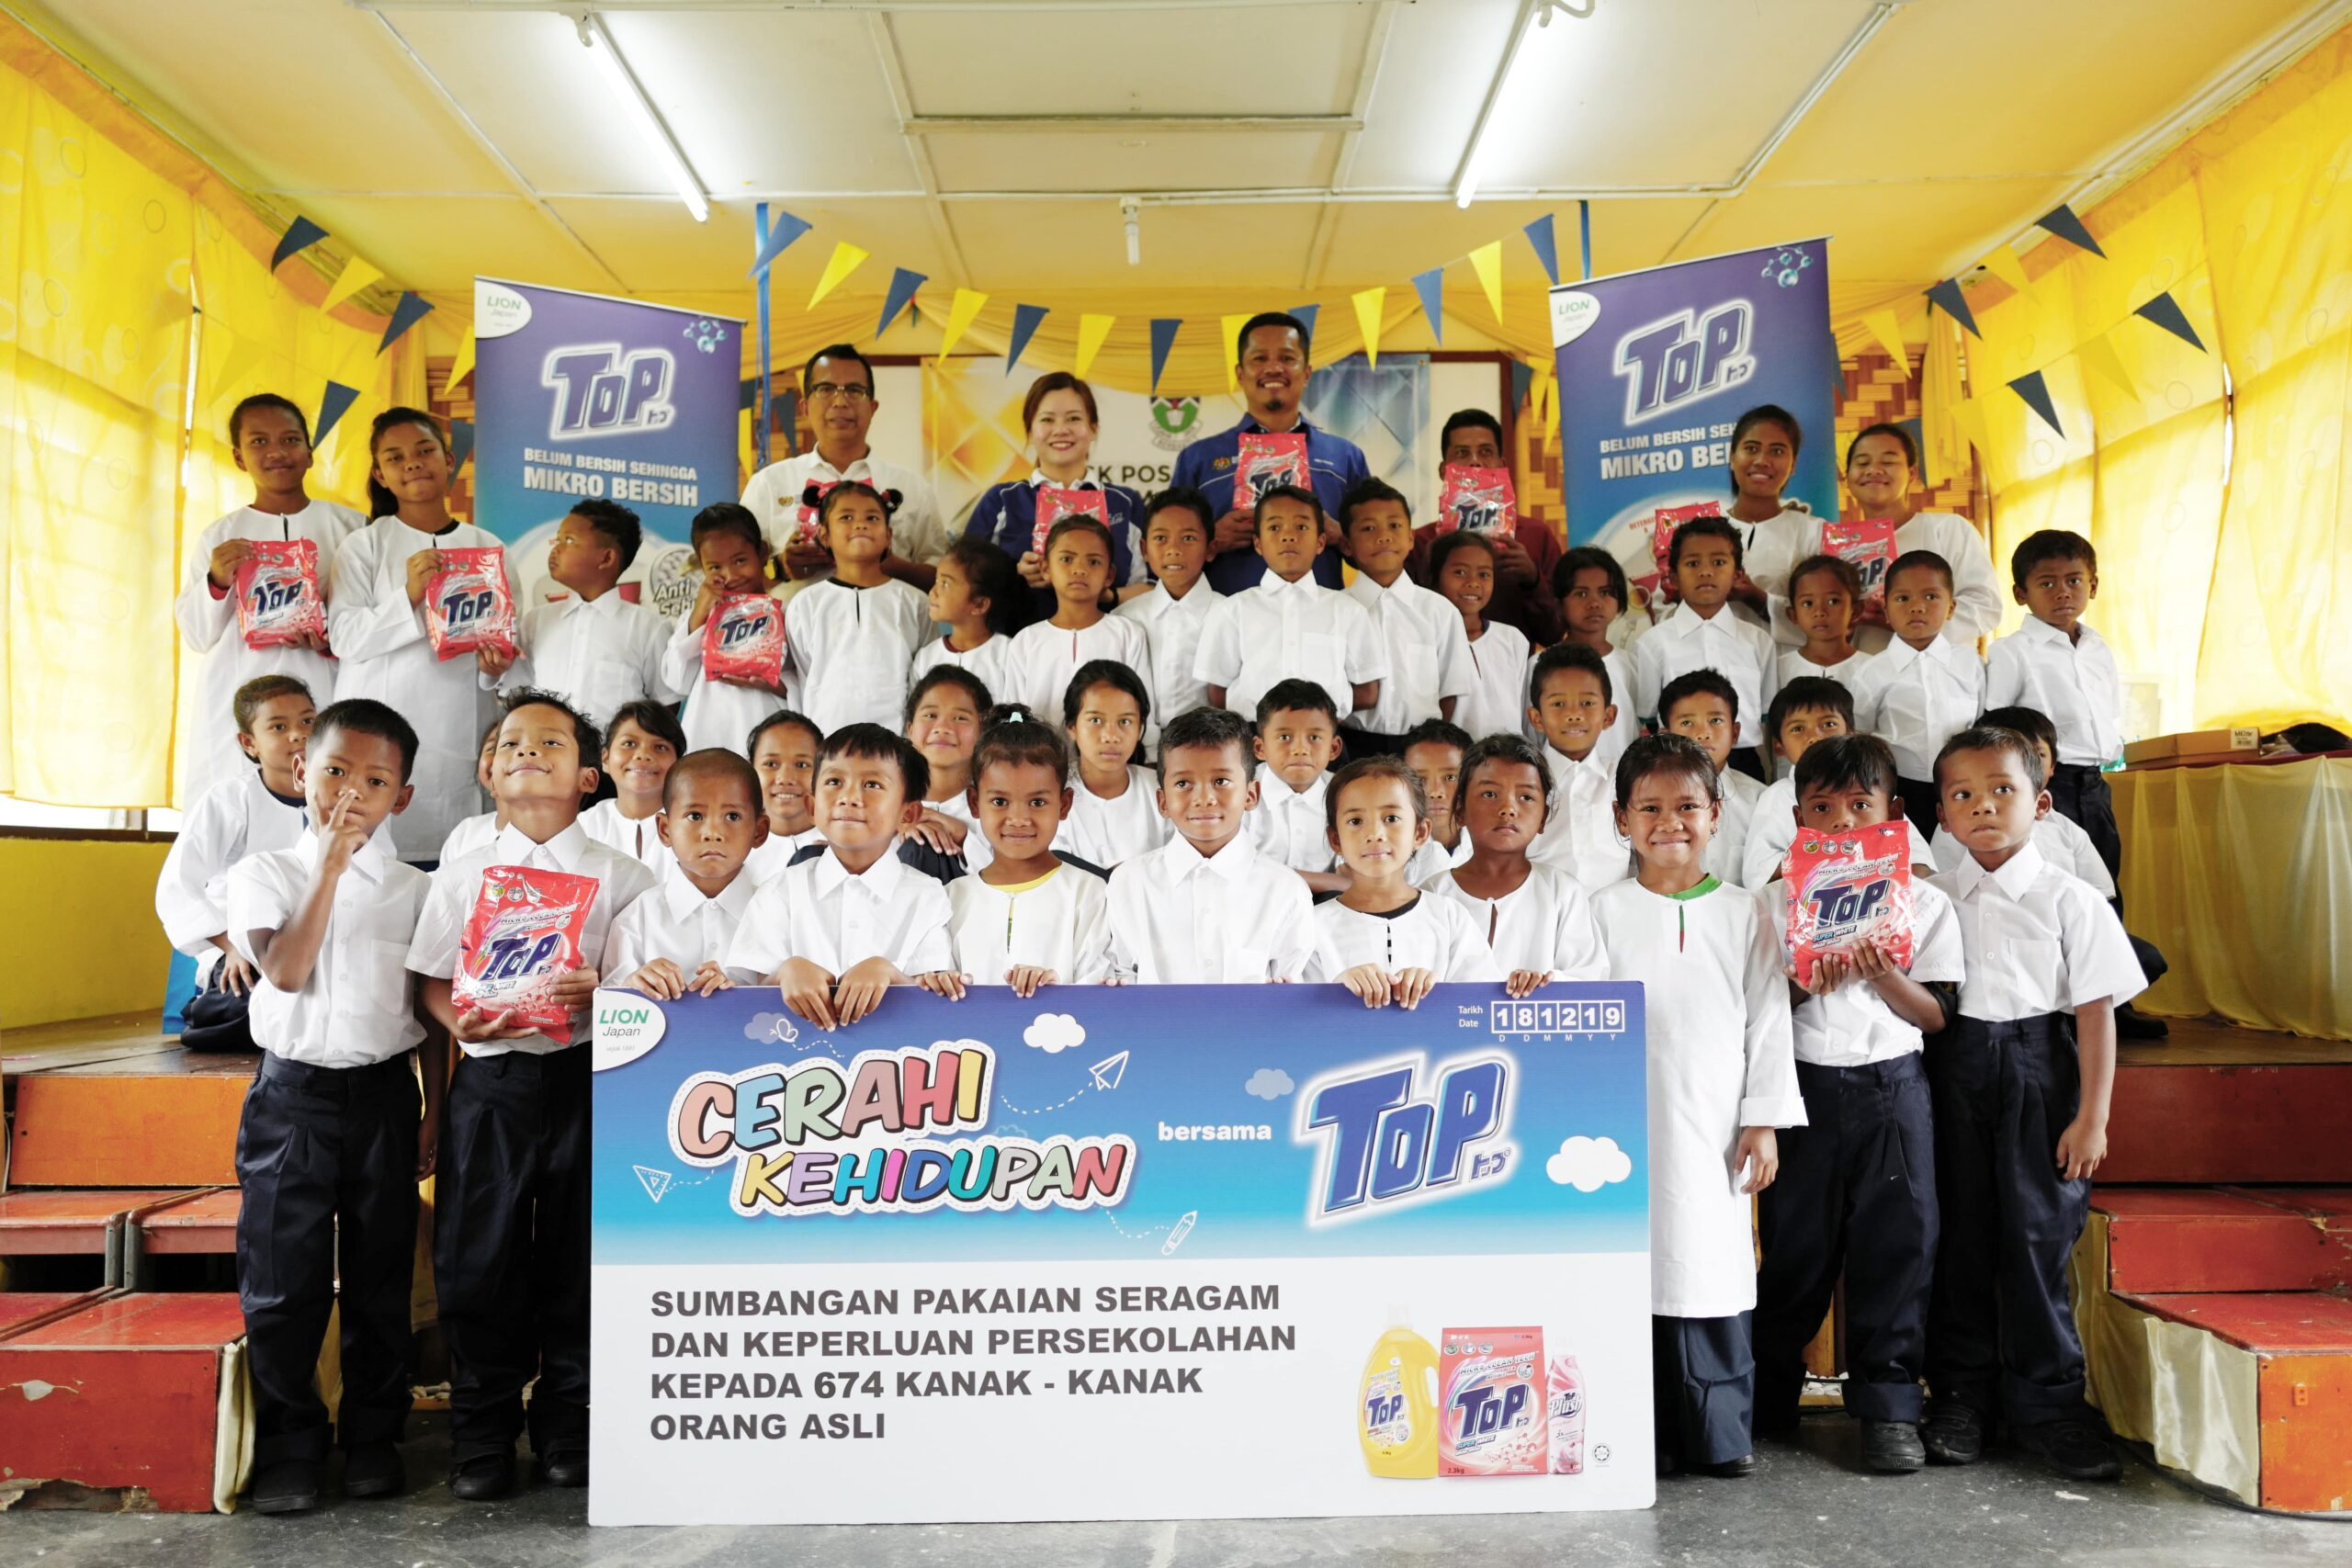 Popular detergent brand does CSR for Orang Asli children